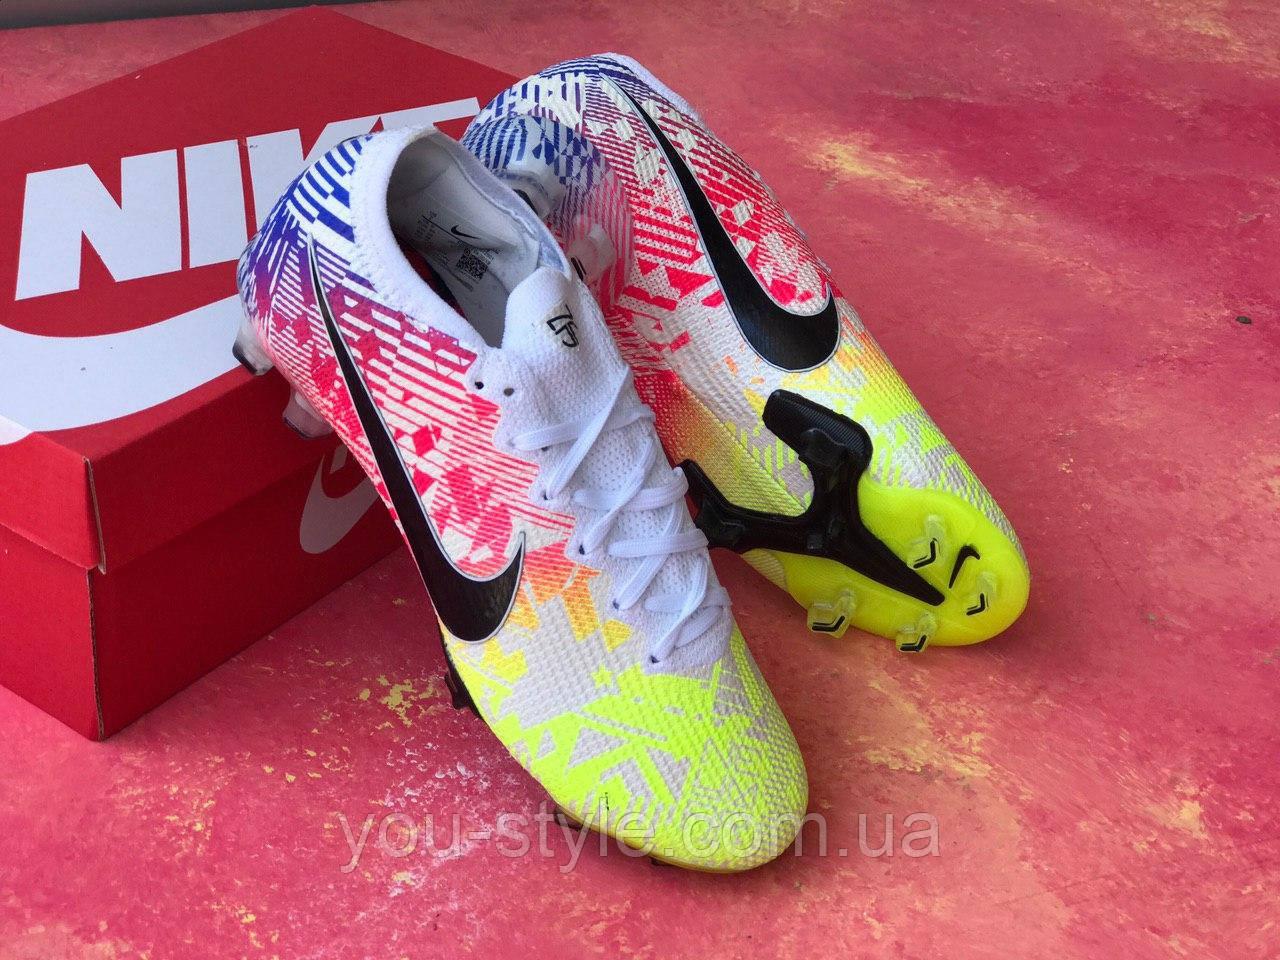 Бутсы Nike Mercurial Vapor 13 Academy Neymar Jr. MG/найк меркуриал вапор/ копы